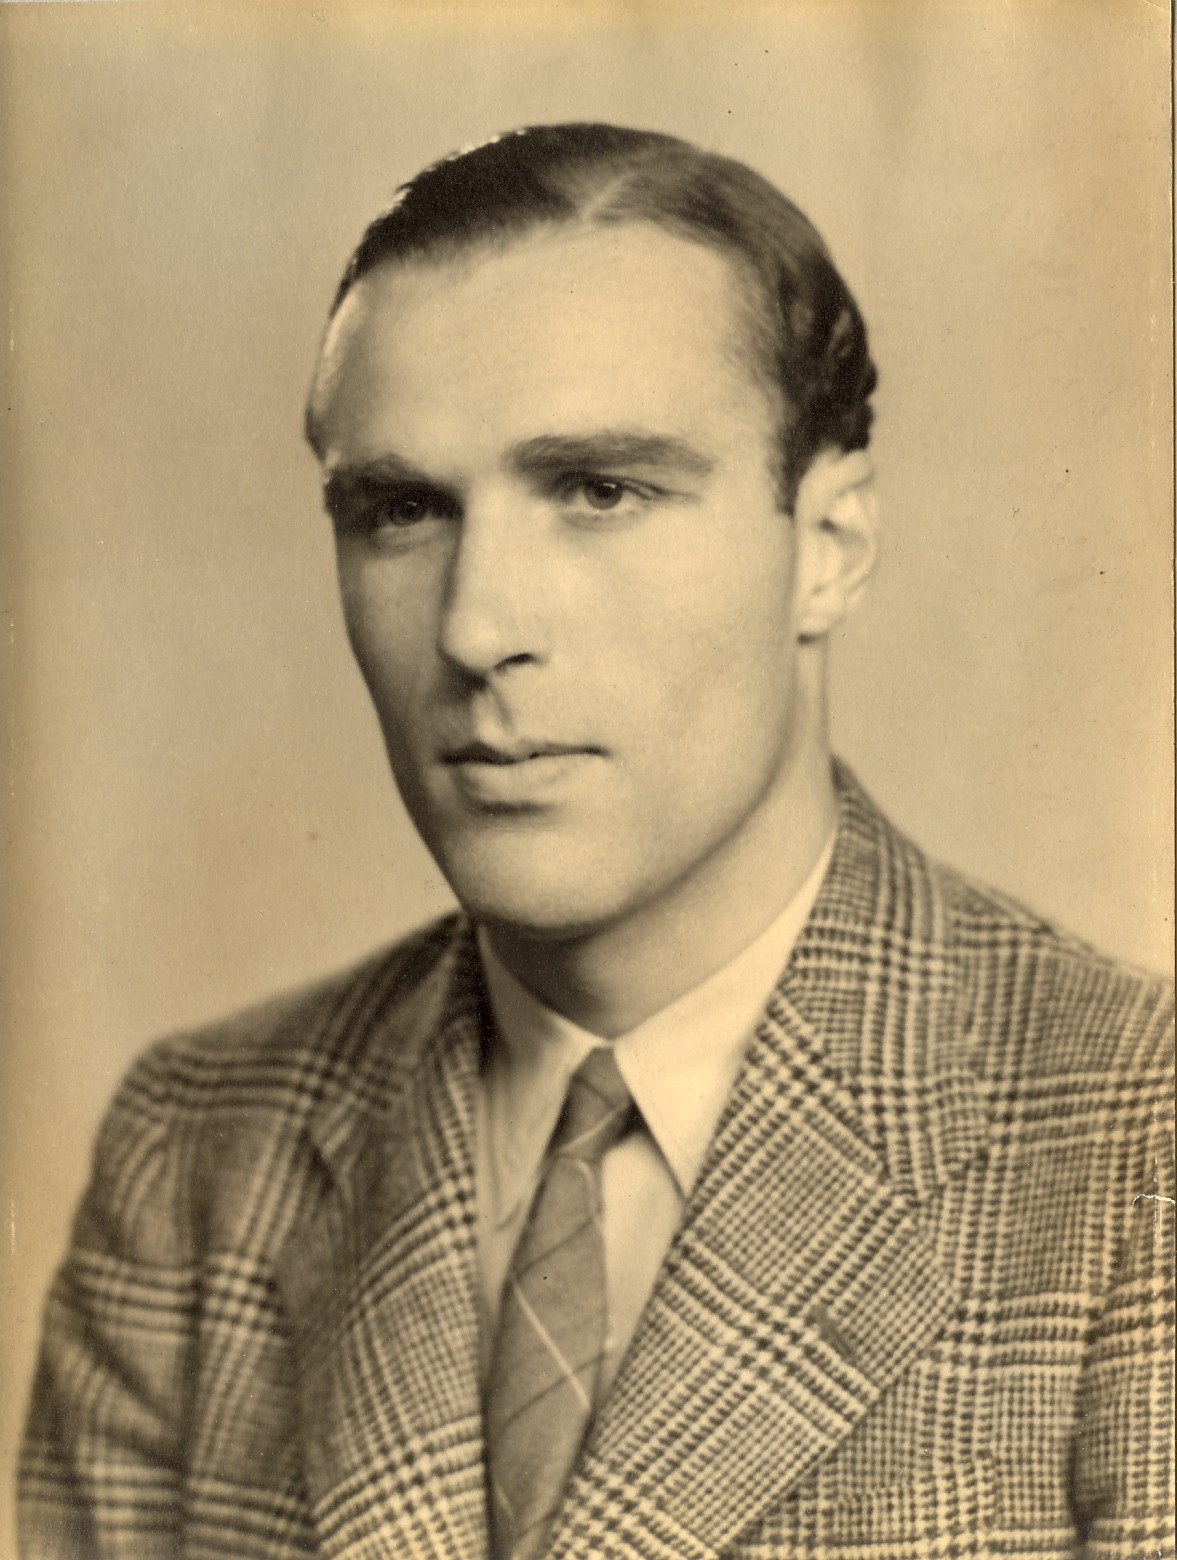 Alan Mervyn Edwards